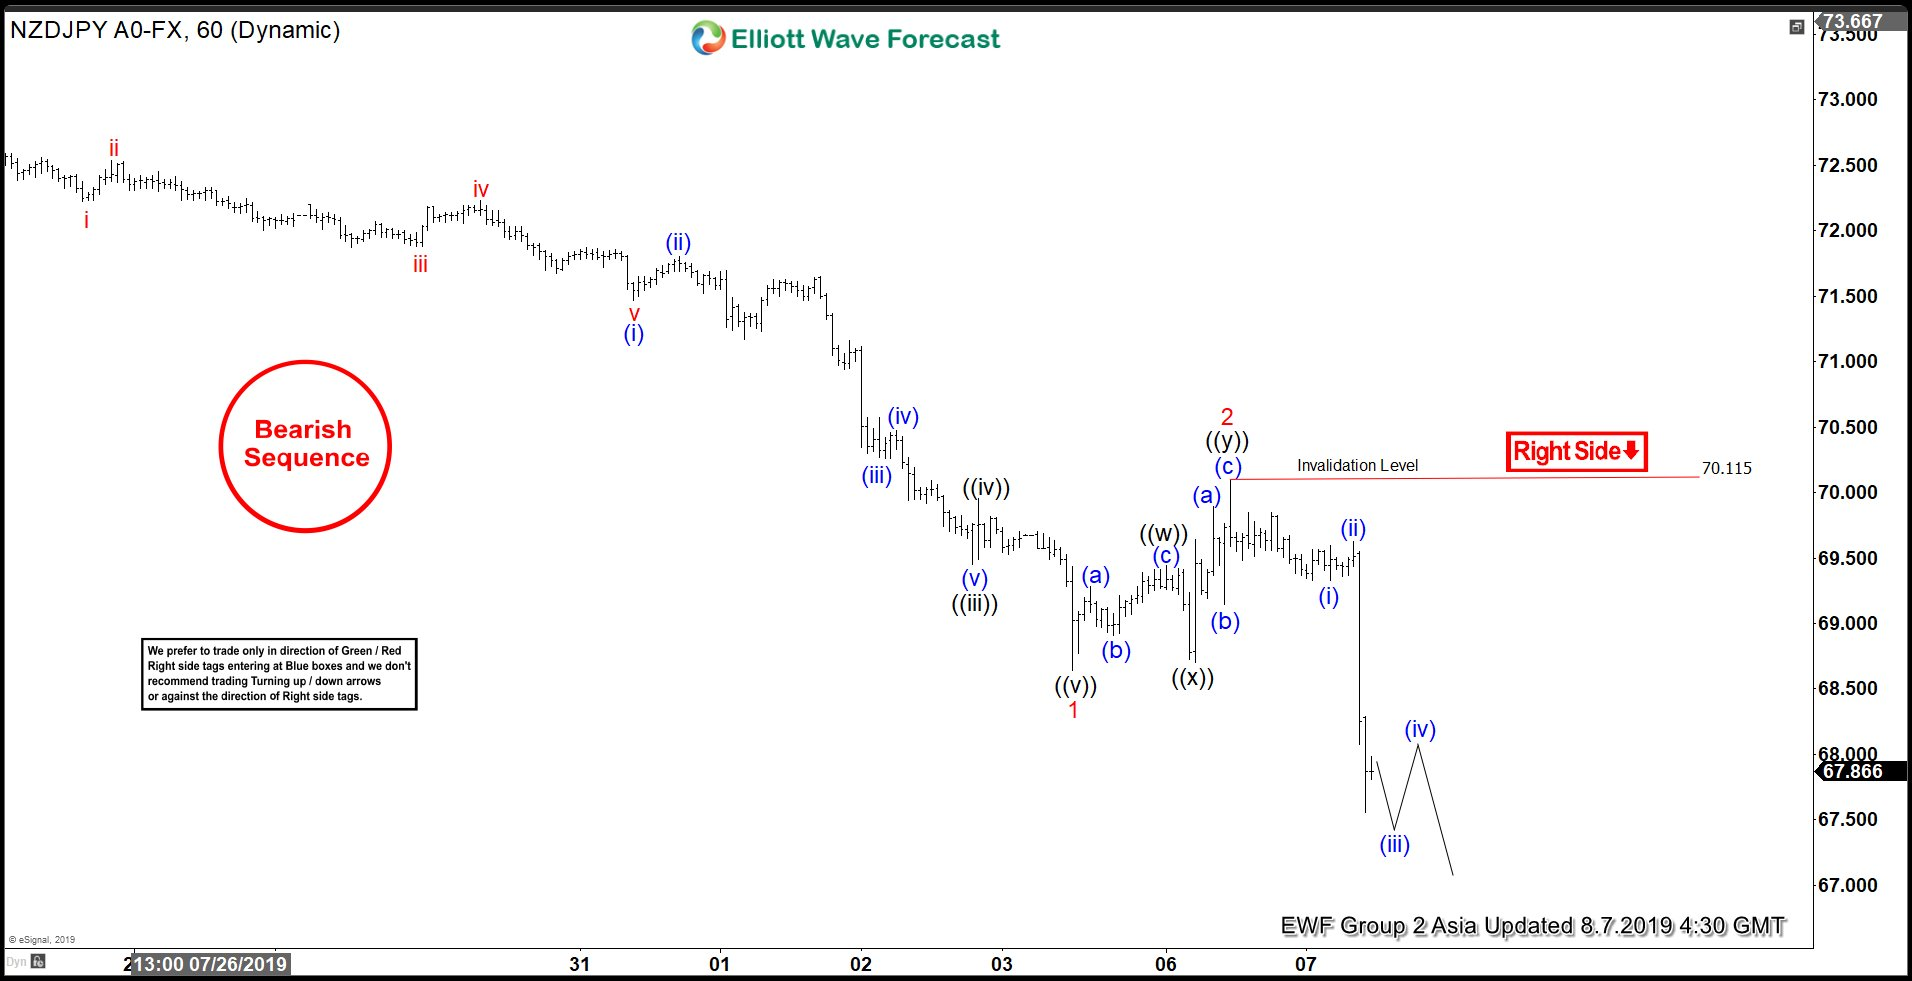 Elliott Wave View: NZDJPY Plunges after RBNZ 50 bp Rate Cut